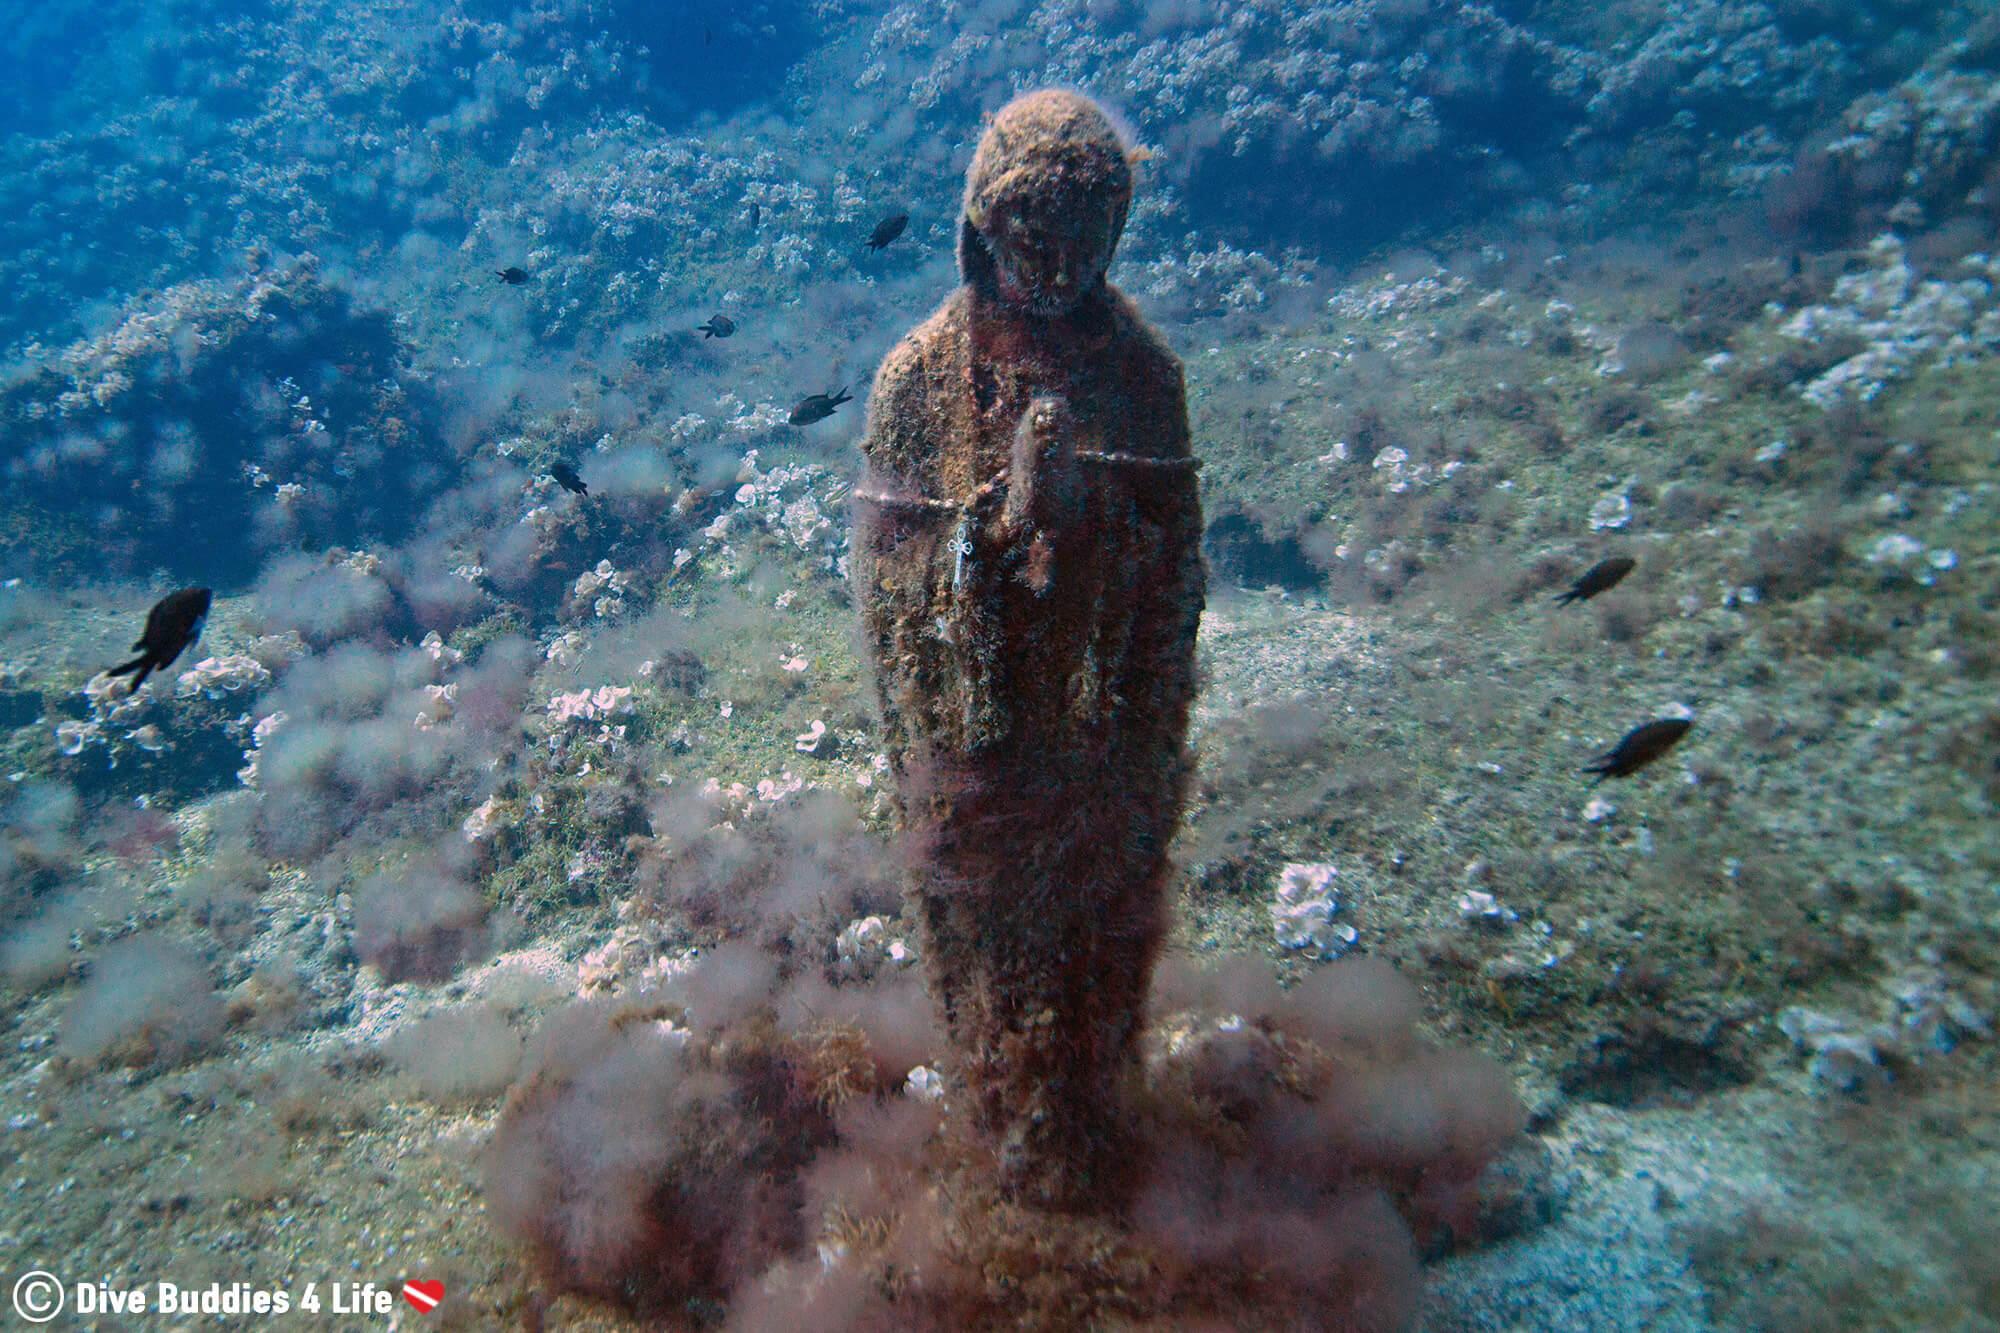 Underwater Virgin Mary Statue In Italy